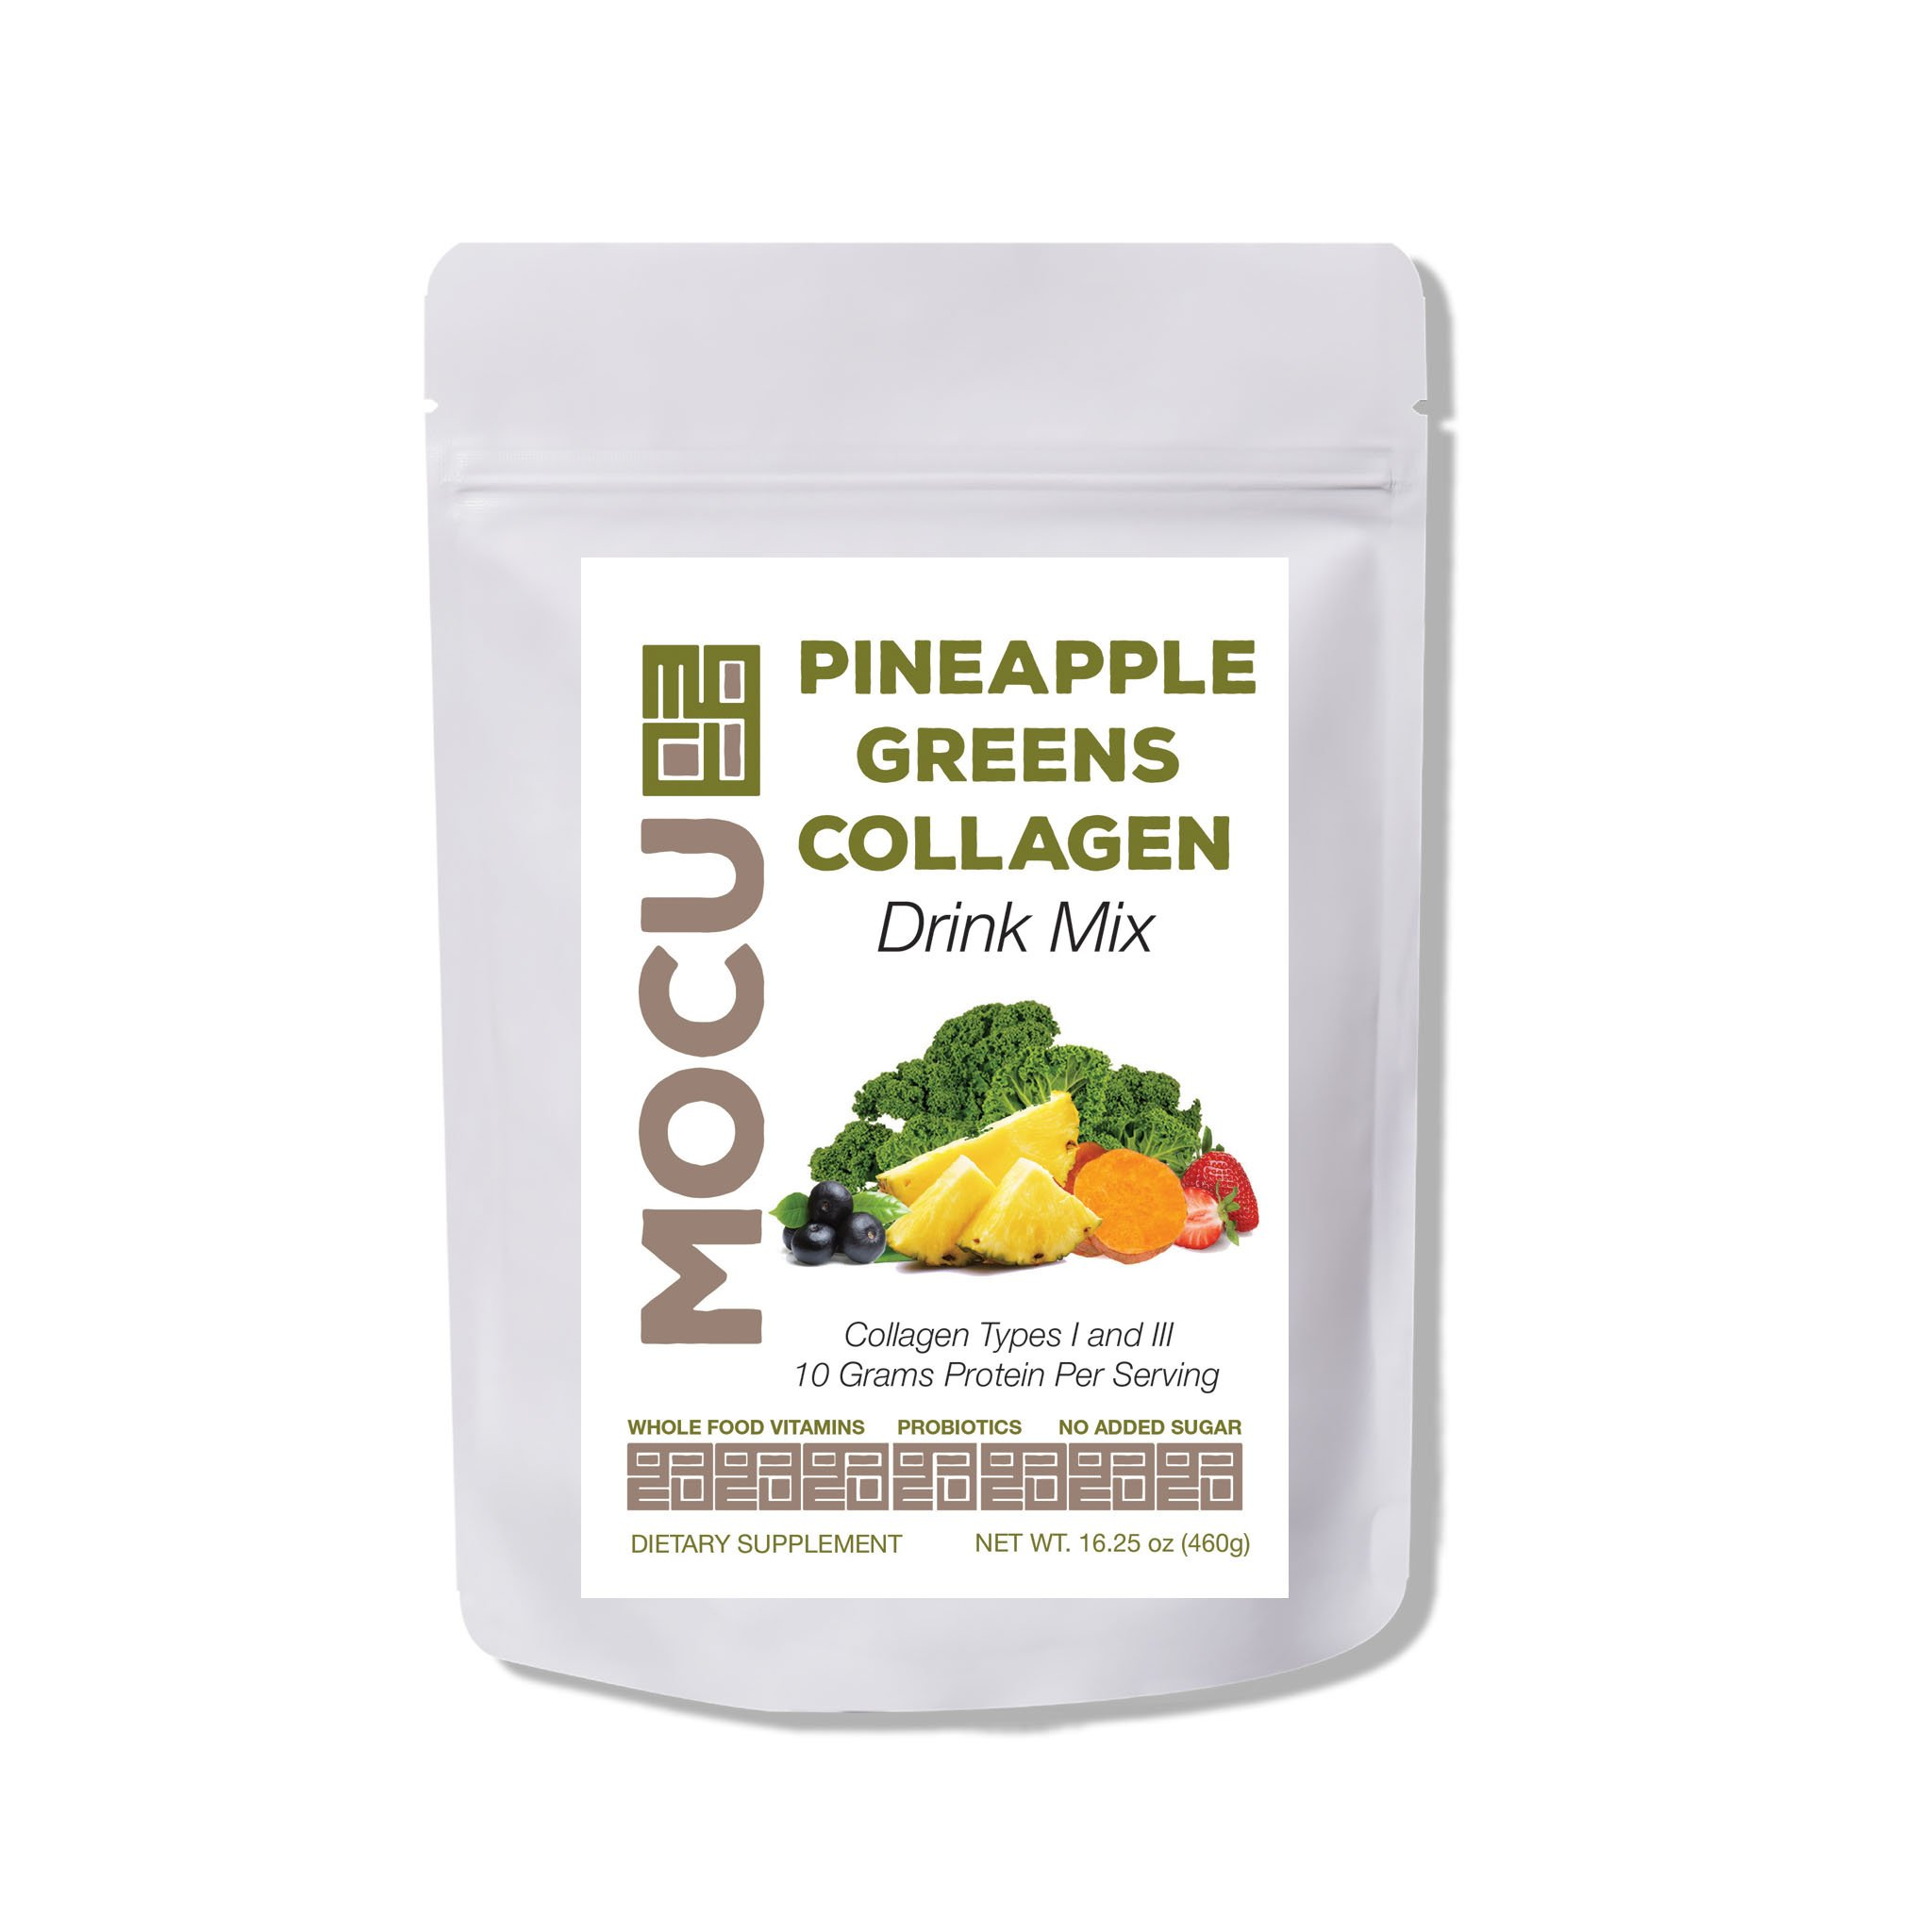 mocu-pineapple-greens-collagen-drink-mix-front.jpg